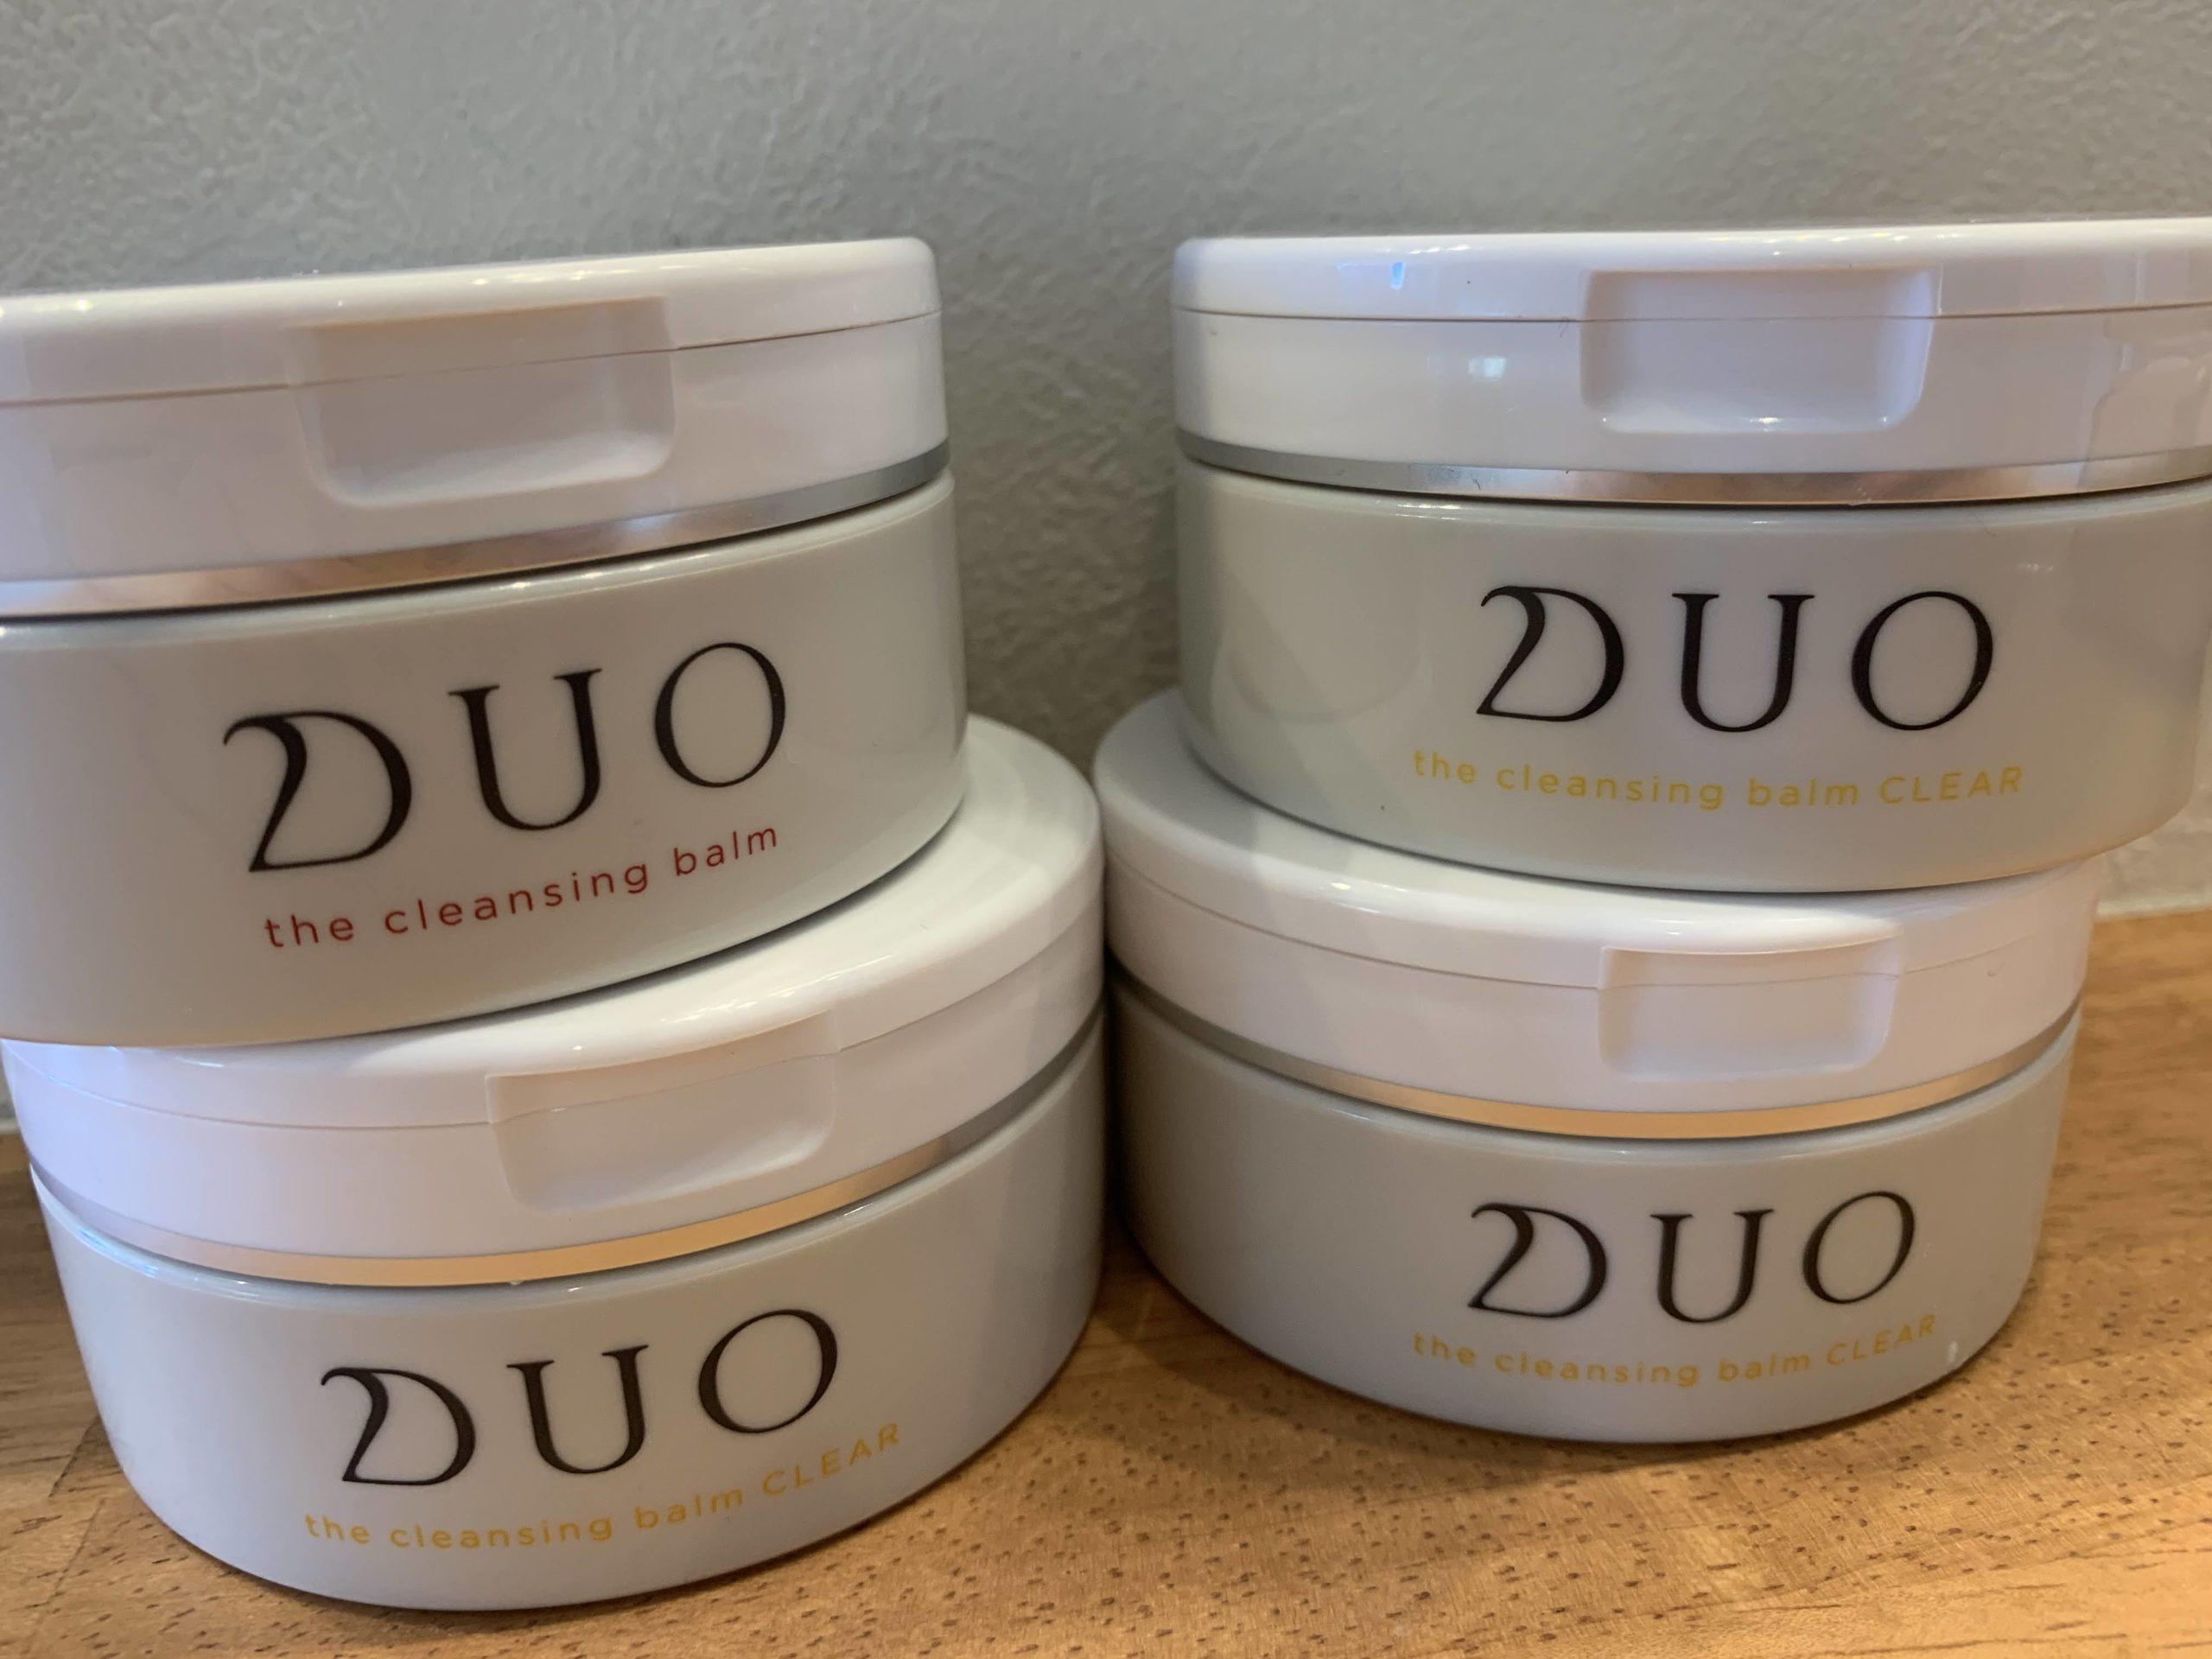 DUOクレンジングバームを1年間使ってみて毛穴は綺麗になったのか?写真で比較してみた